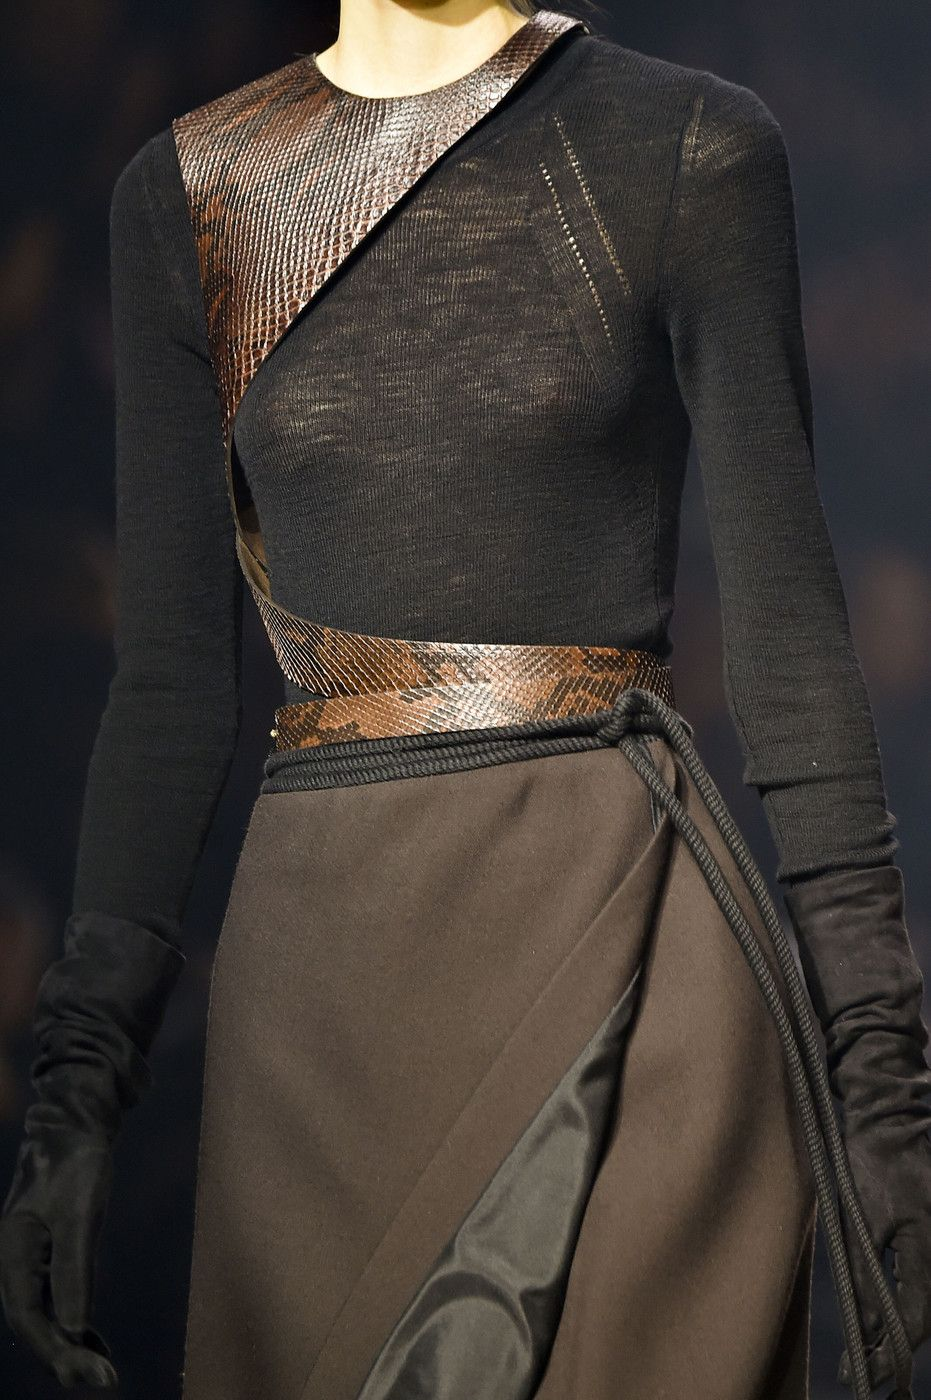 Lanvin at Paris Fashion Week Fall 2015